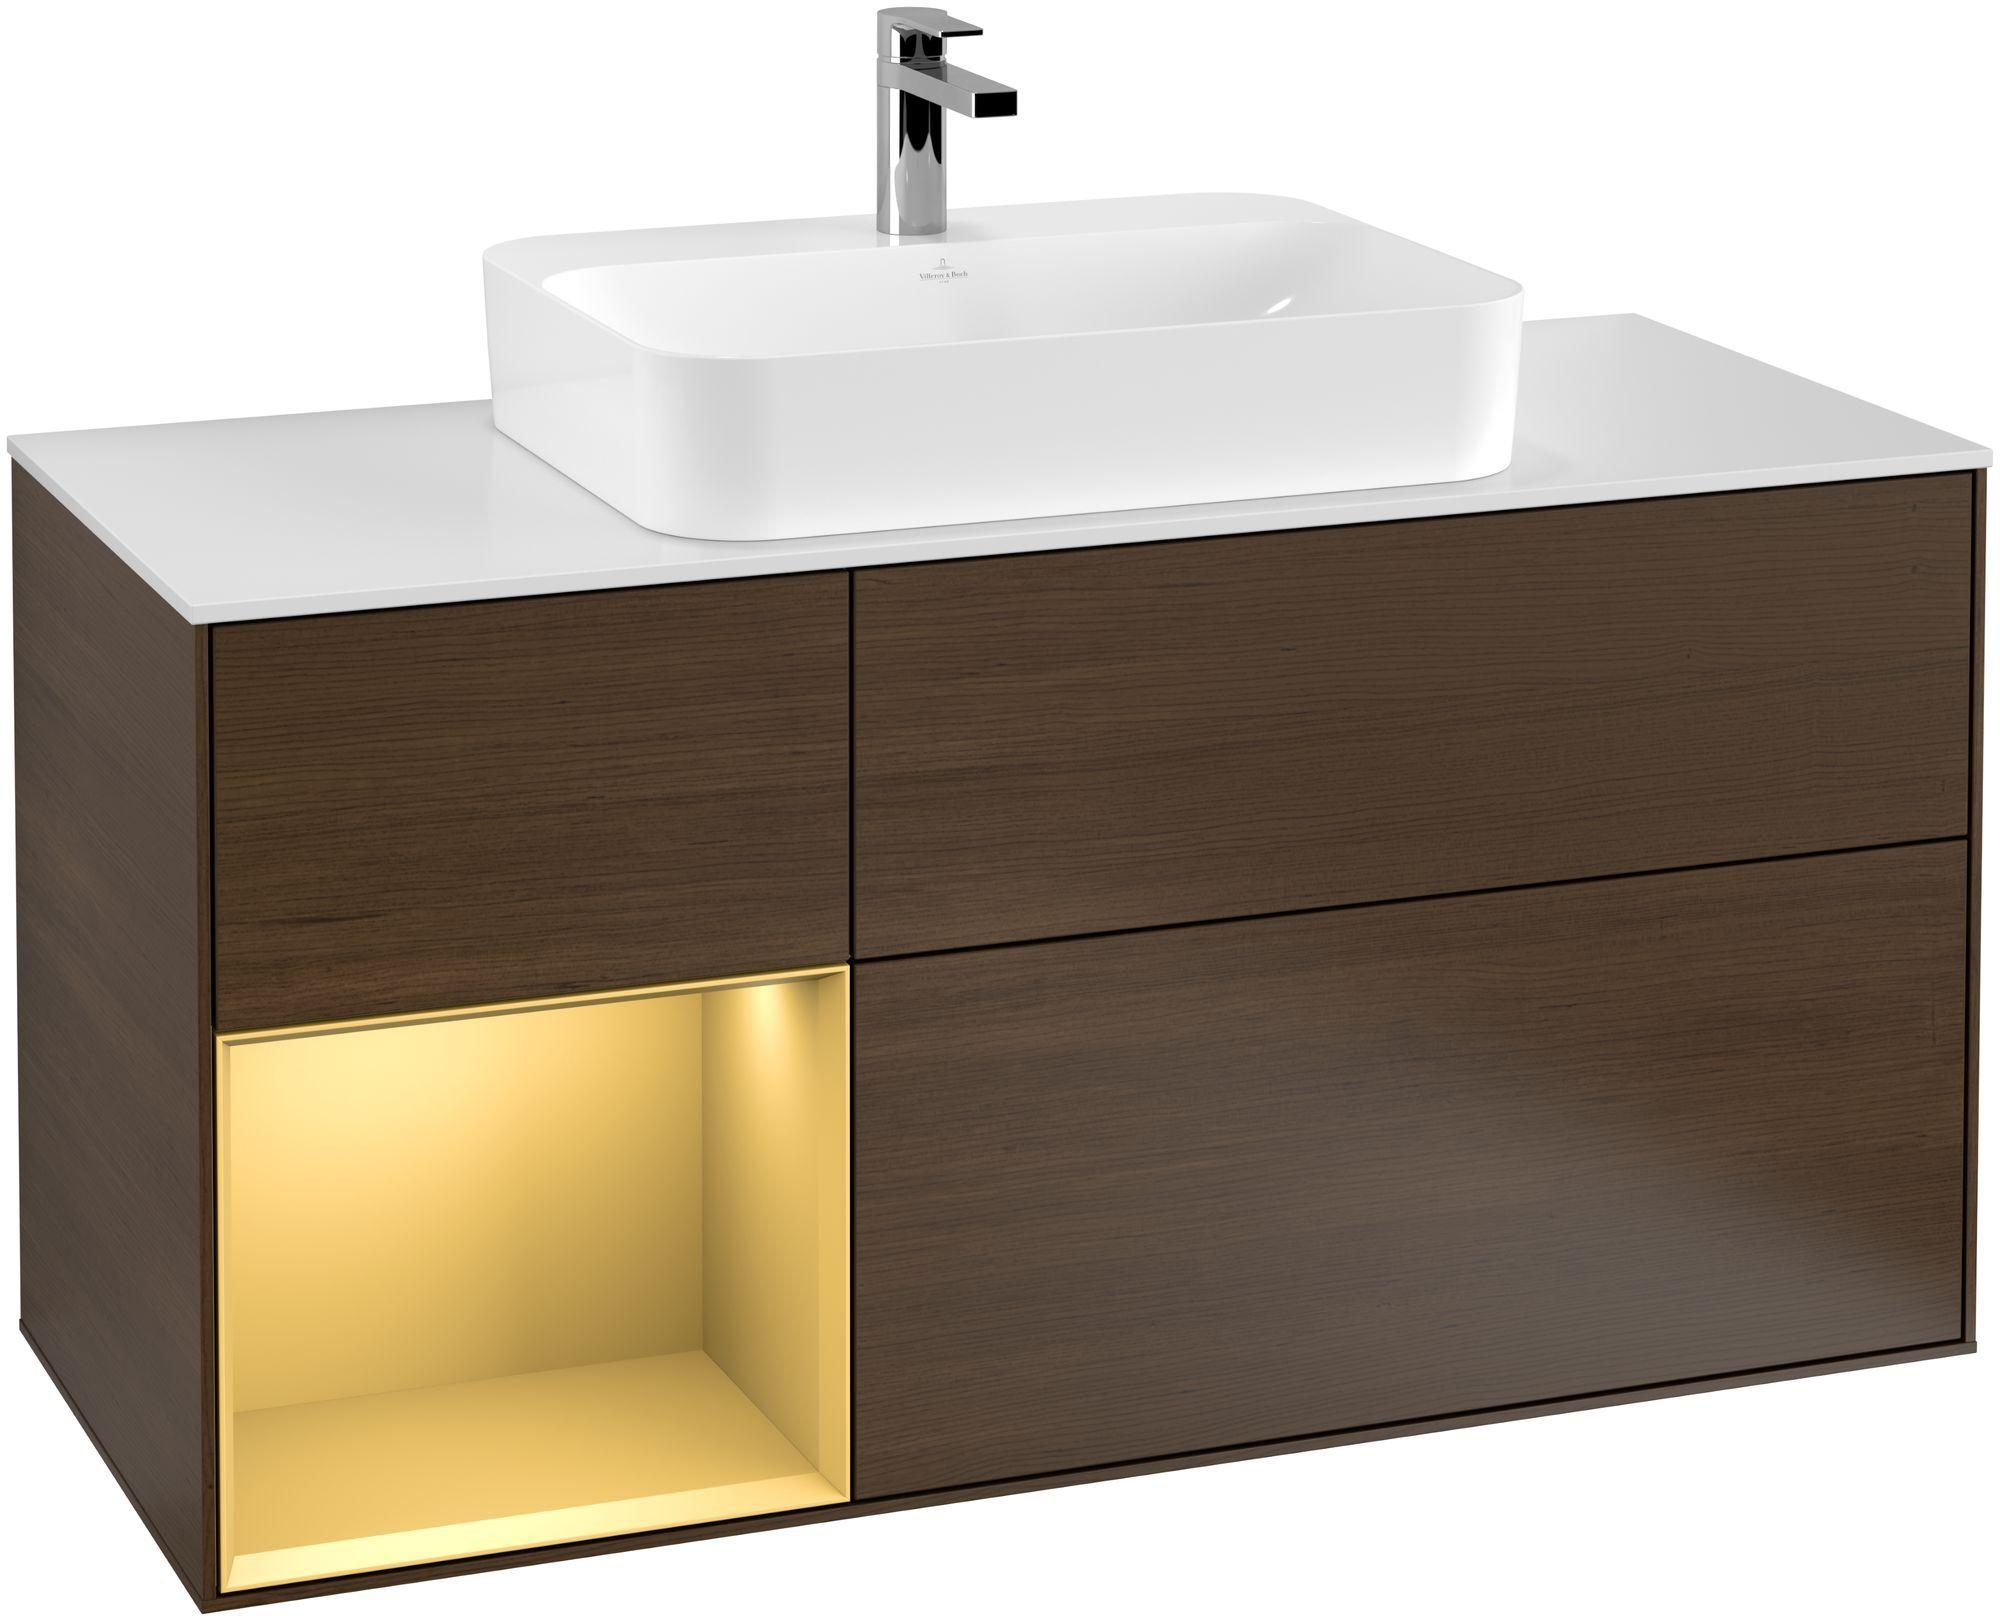 Villeroy & Boch Finion F41 Waschtischunterschrank mit Regalelement 3 Auszüge Waschtisch mittig LED-Beleuchtung B:120xH:60,3xT:50,1cm Front, Korpus: Walnut Veneer, Regal: Gold Matt, Glasplatte: White Matt F411HFGN